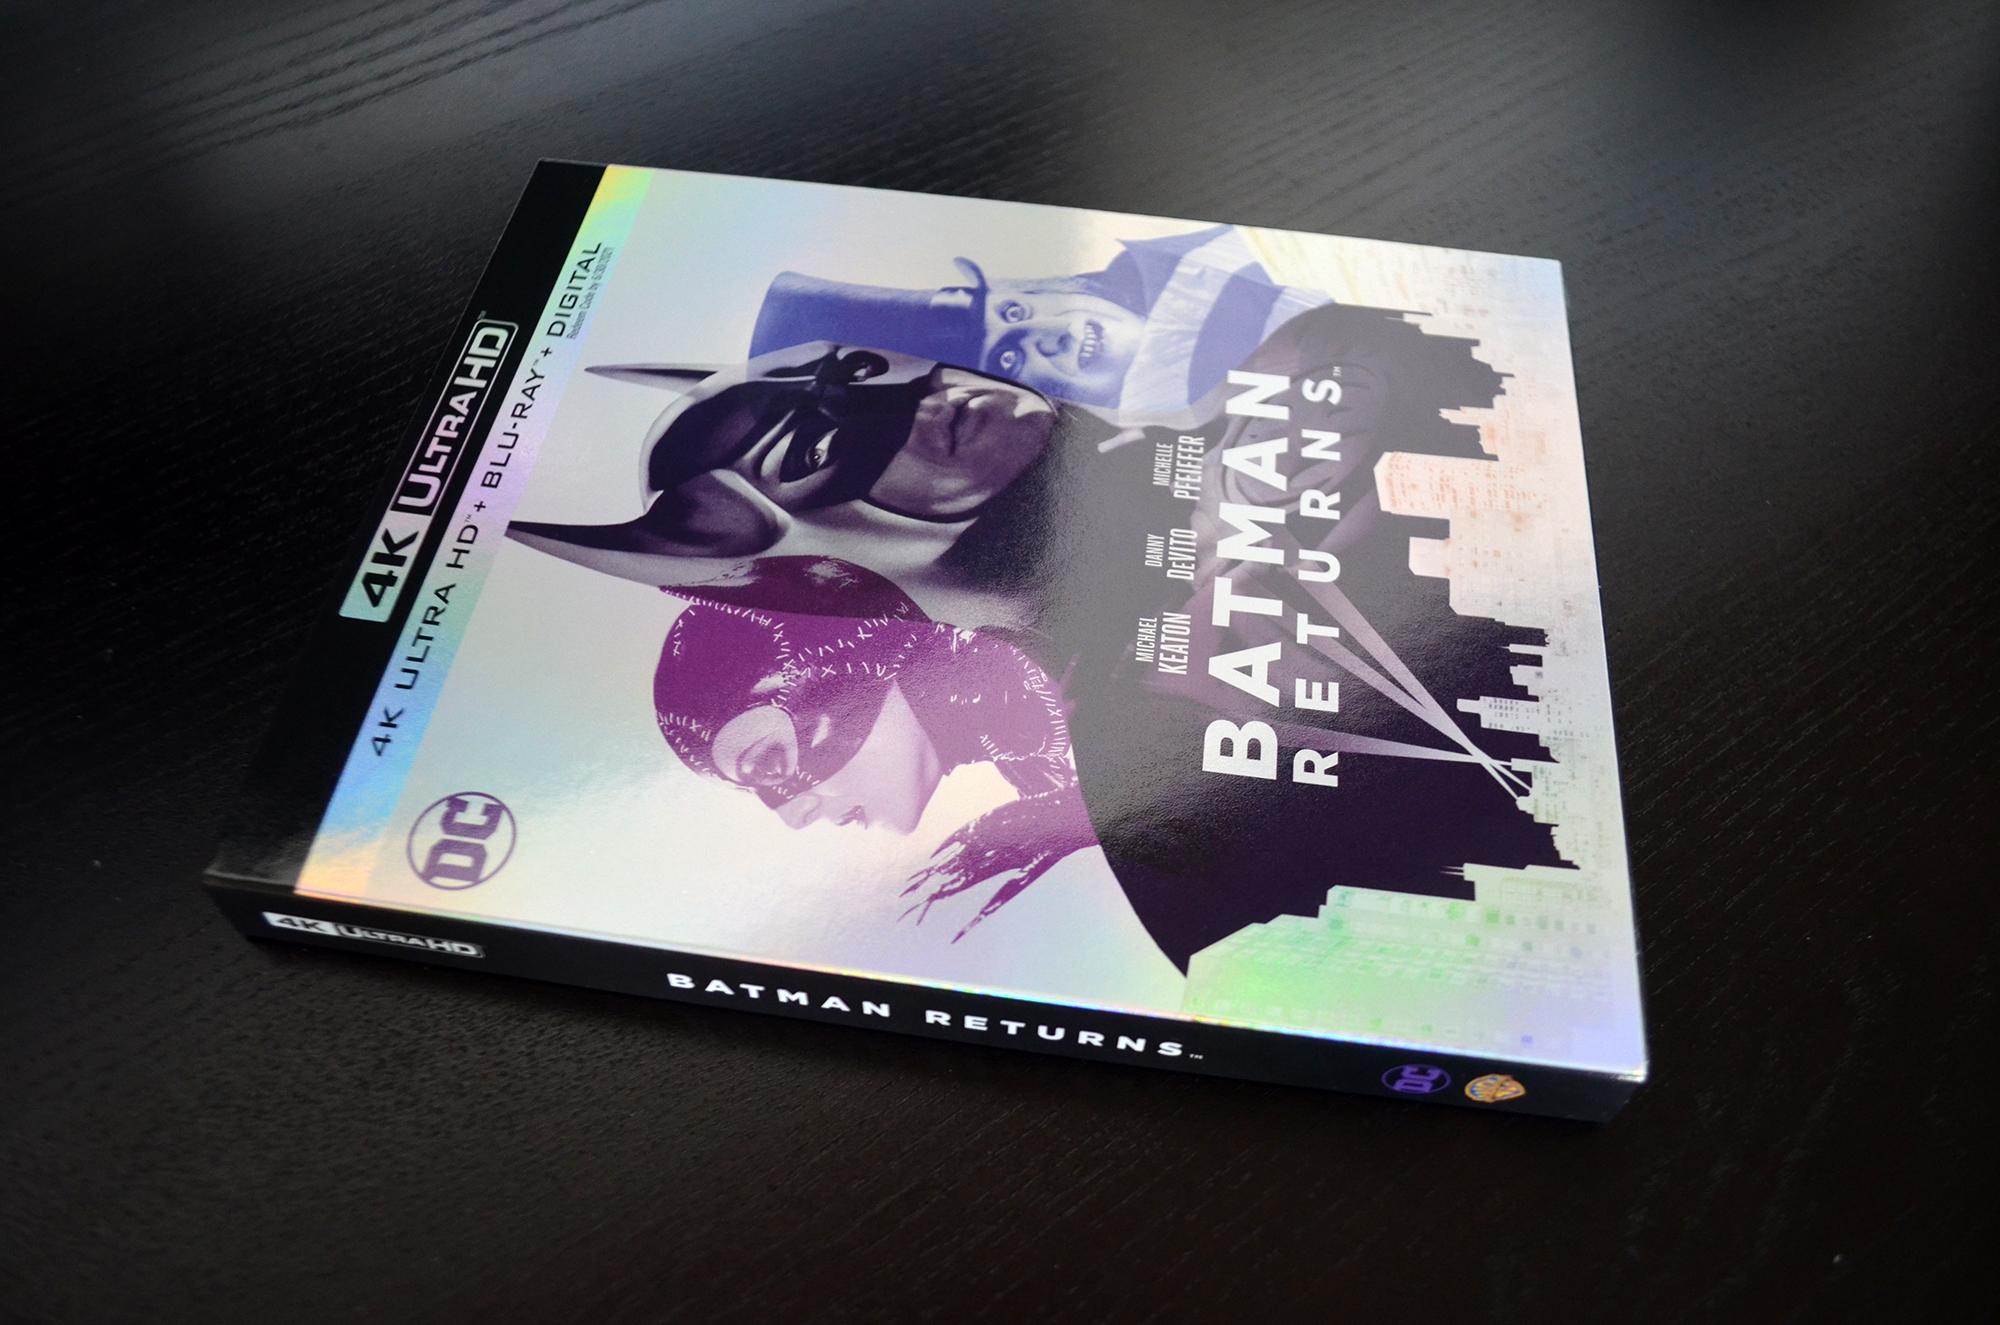 Batman Returns 4K Review